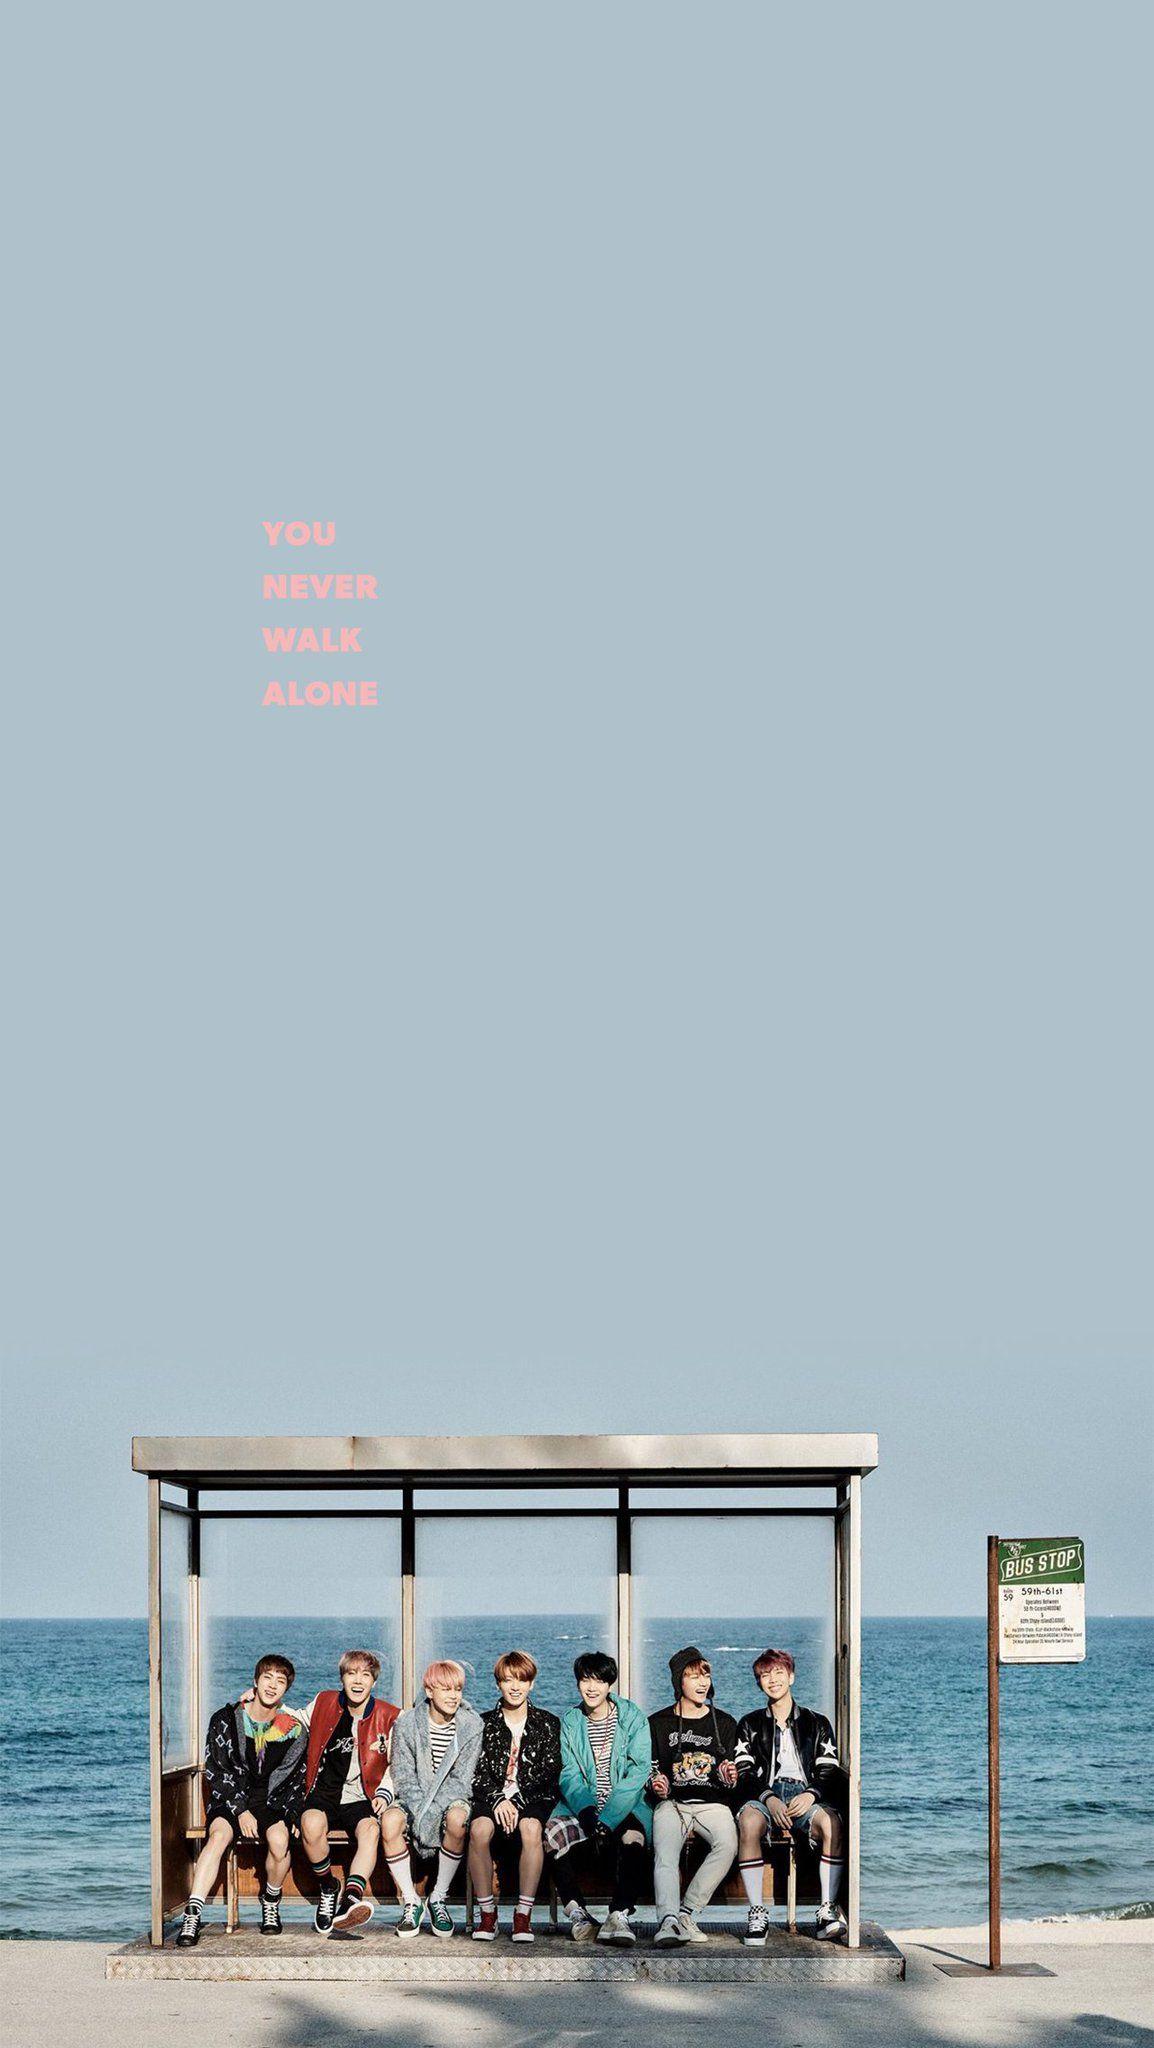 Bts You Never Walk Alone By Tsukinofleur Bts You Never Walk Alone Walking Alone Album Covers